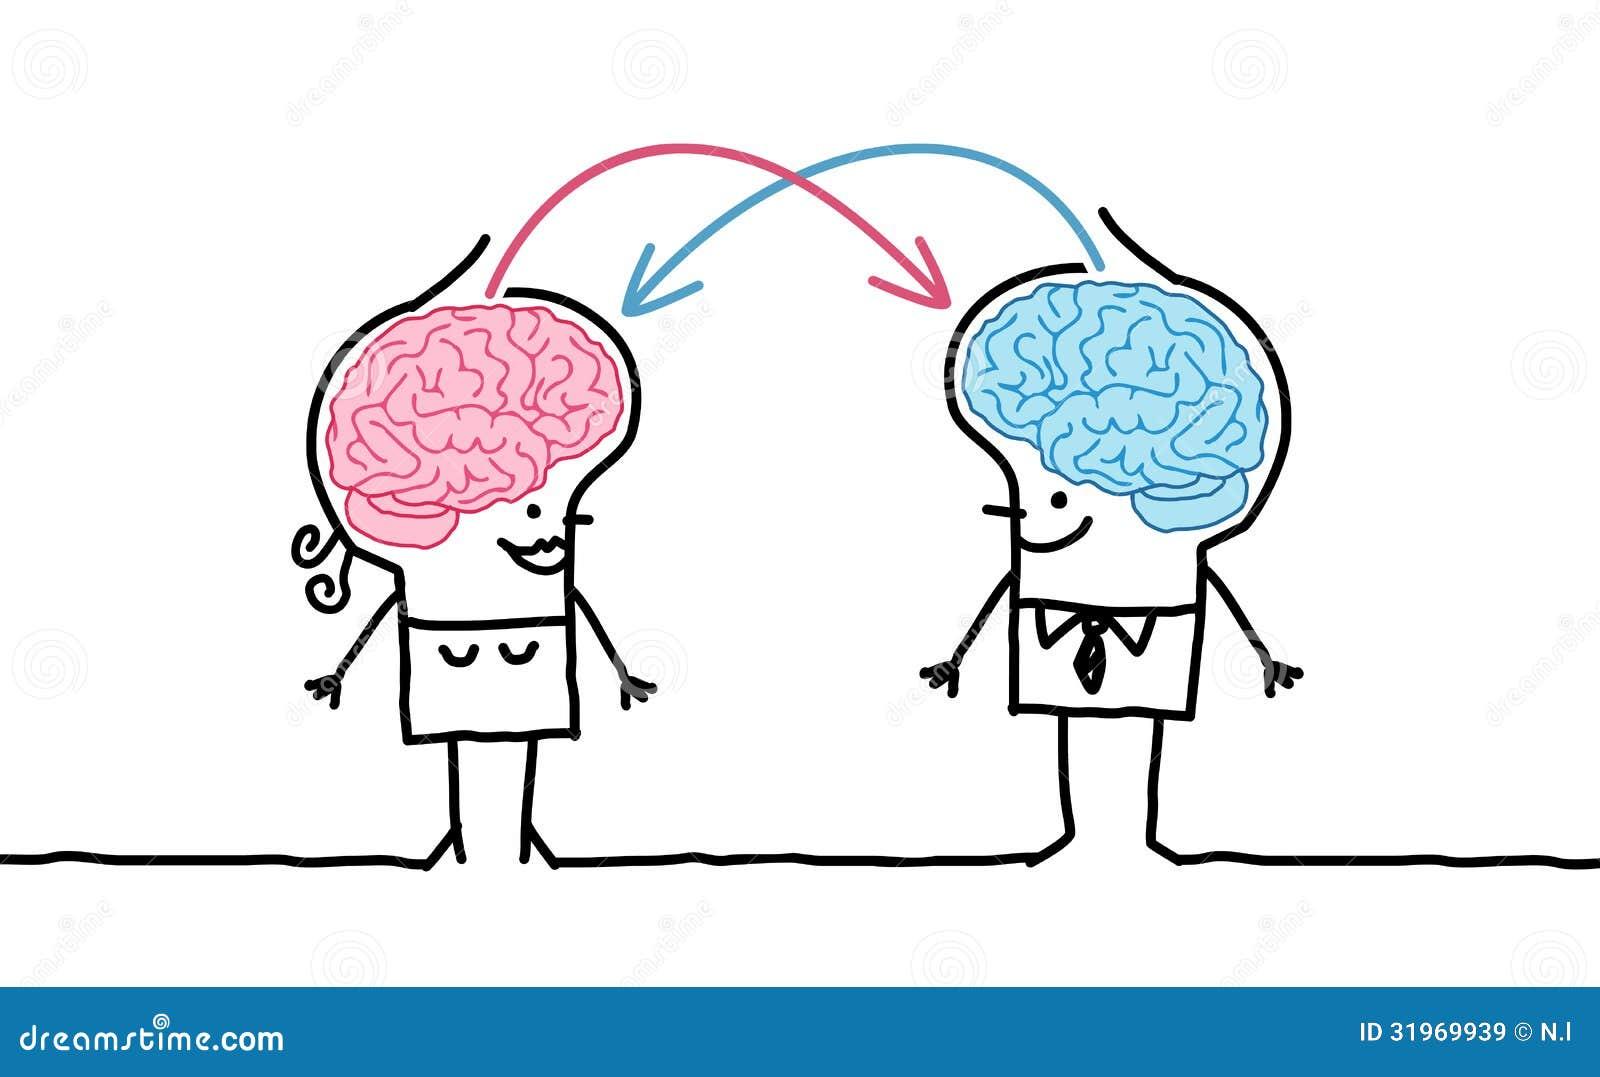 Groot hersenenpaar & uitwisseling